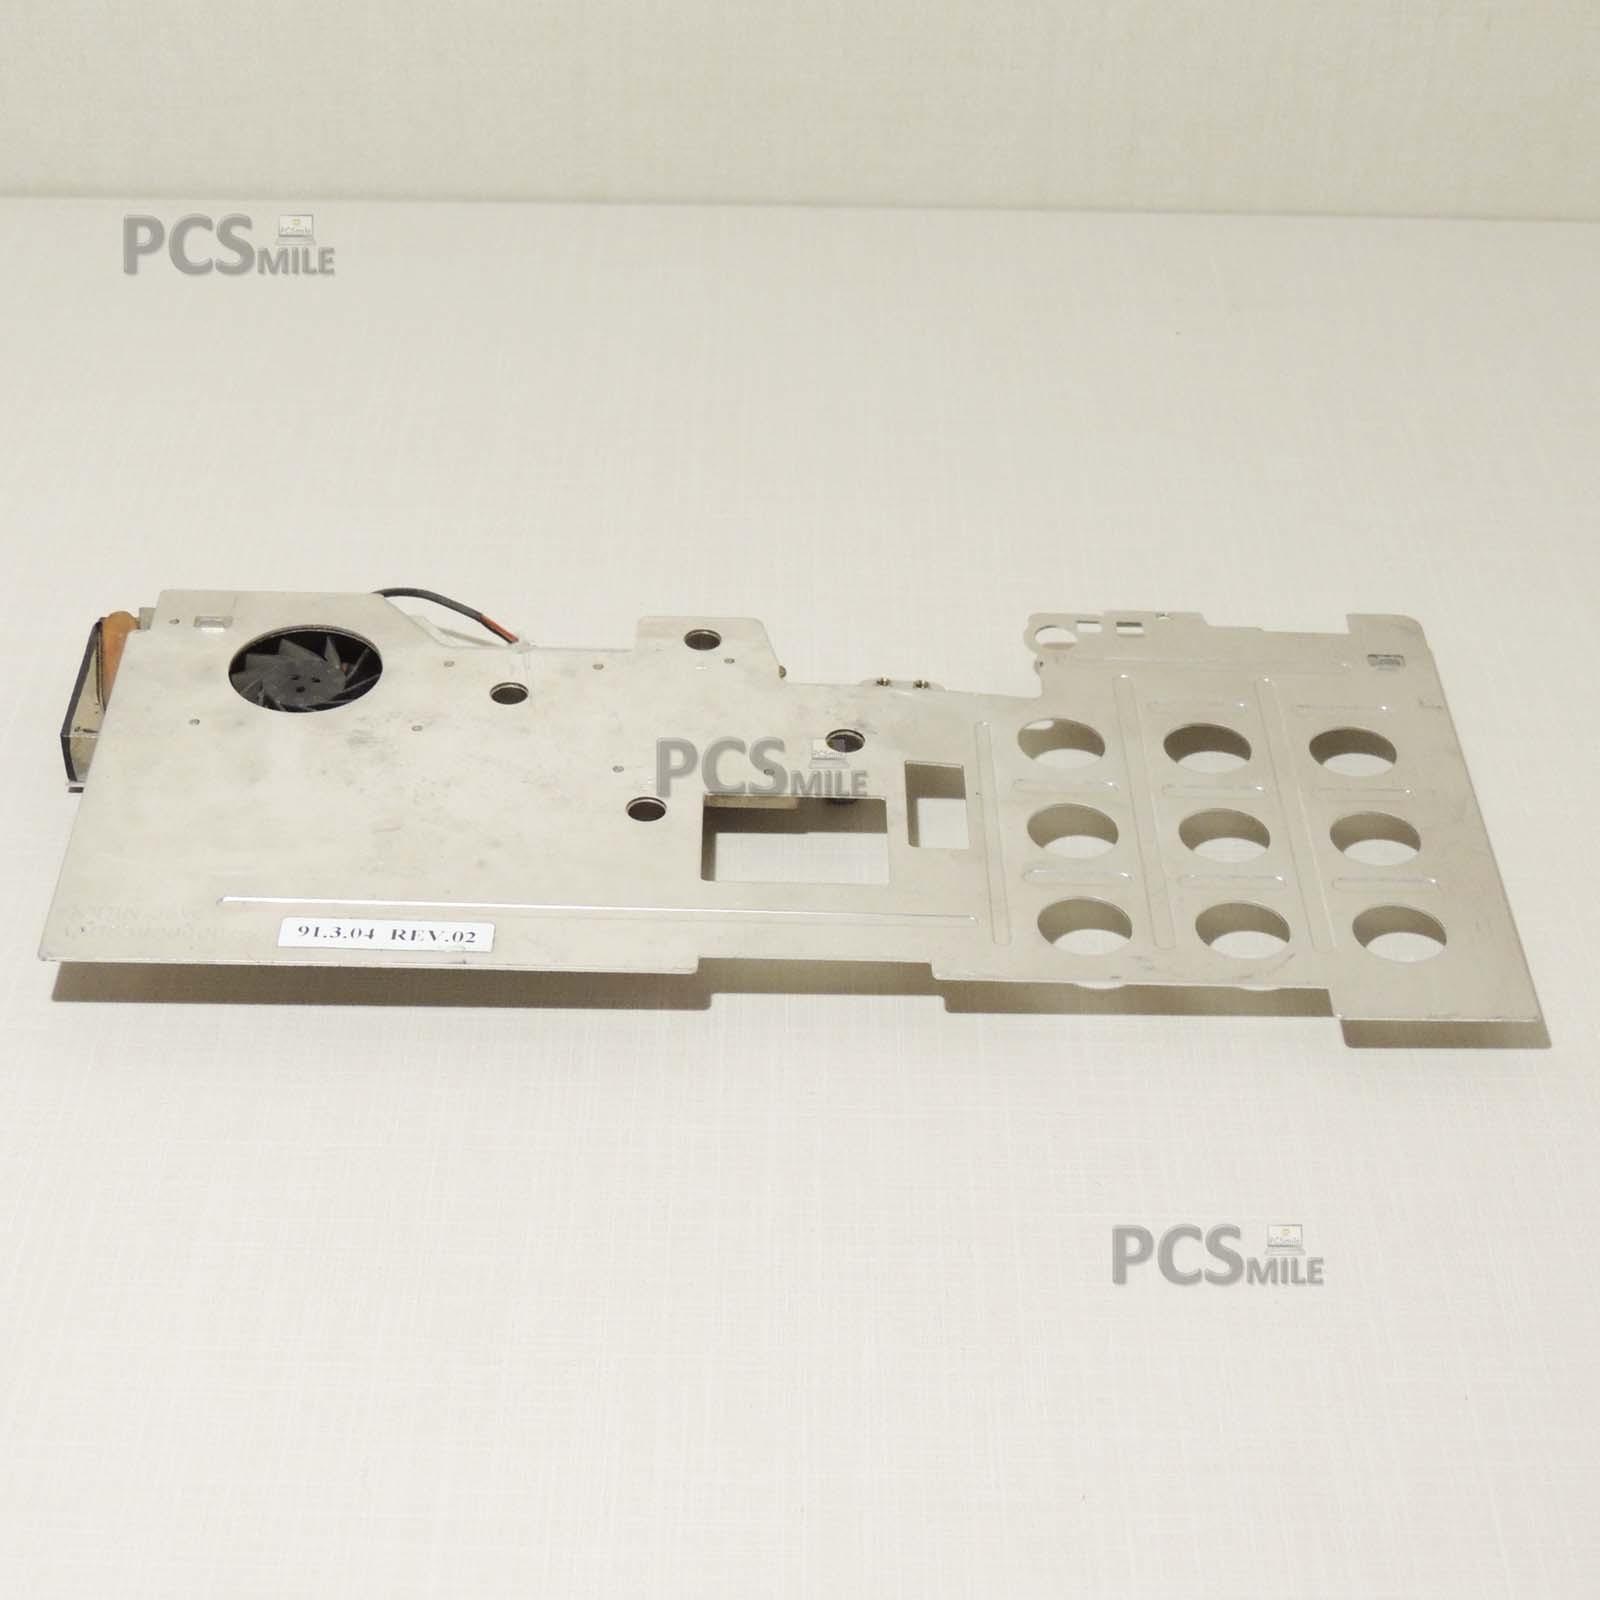 Ventola e dissipatore HP Compaq Presario F700 273495-001 AAB850200001SO GC054509BX-8